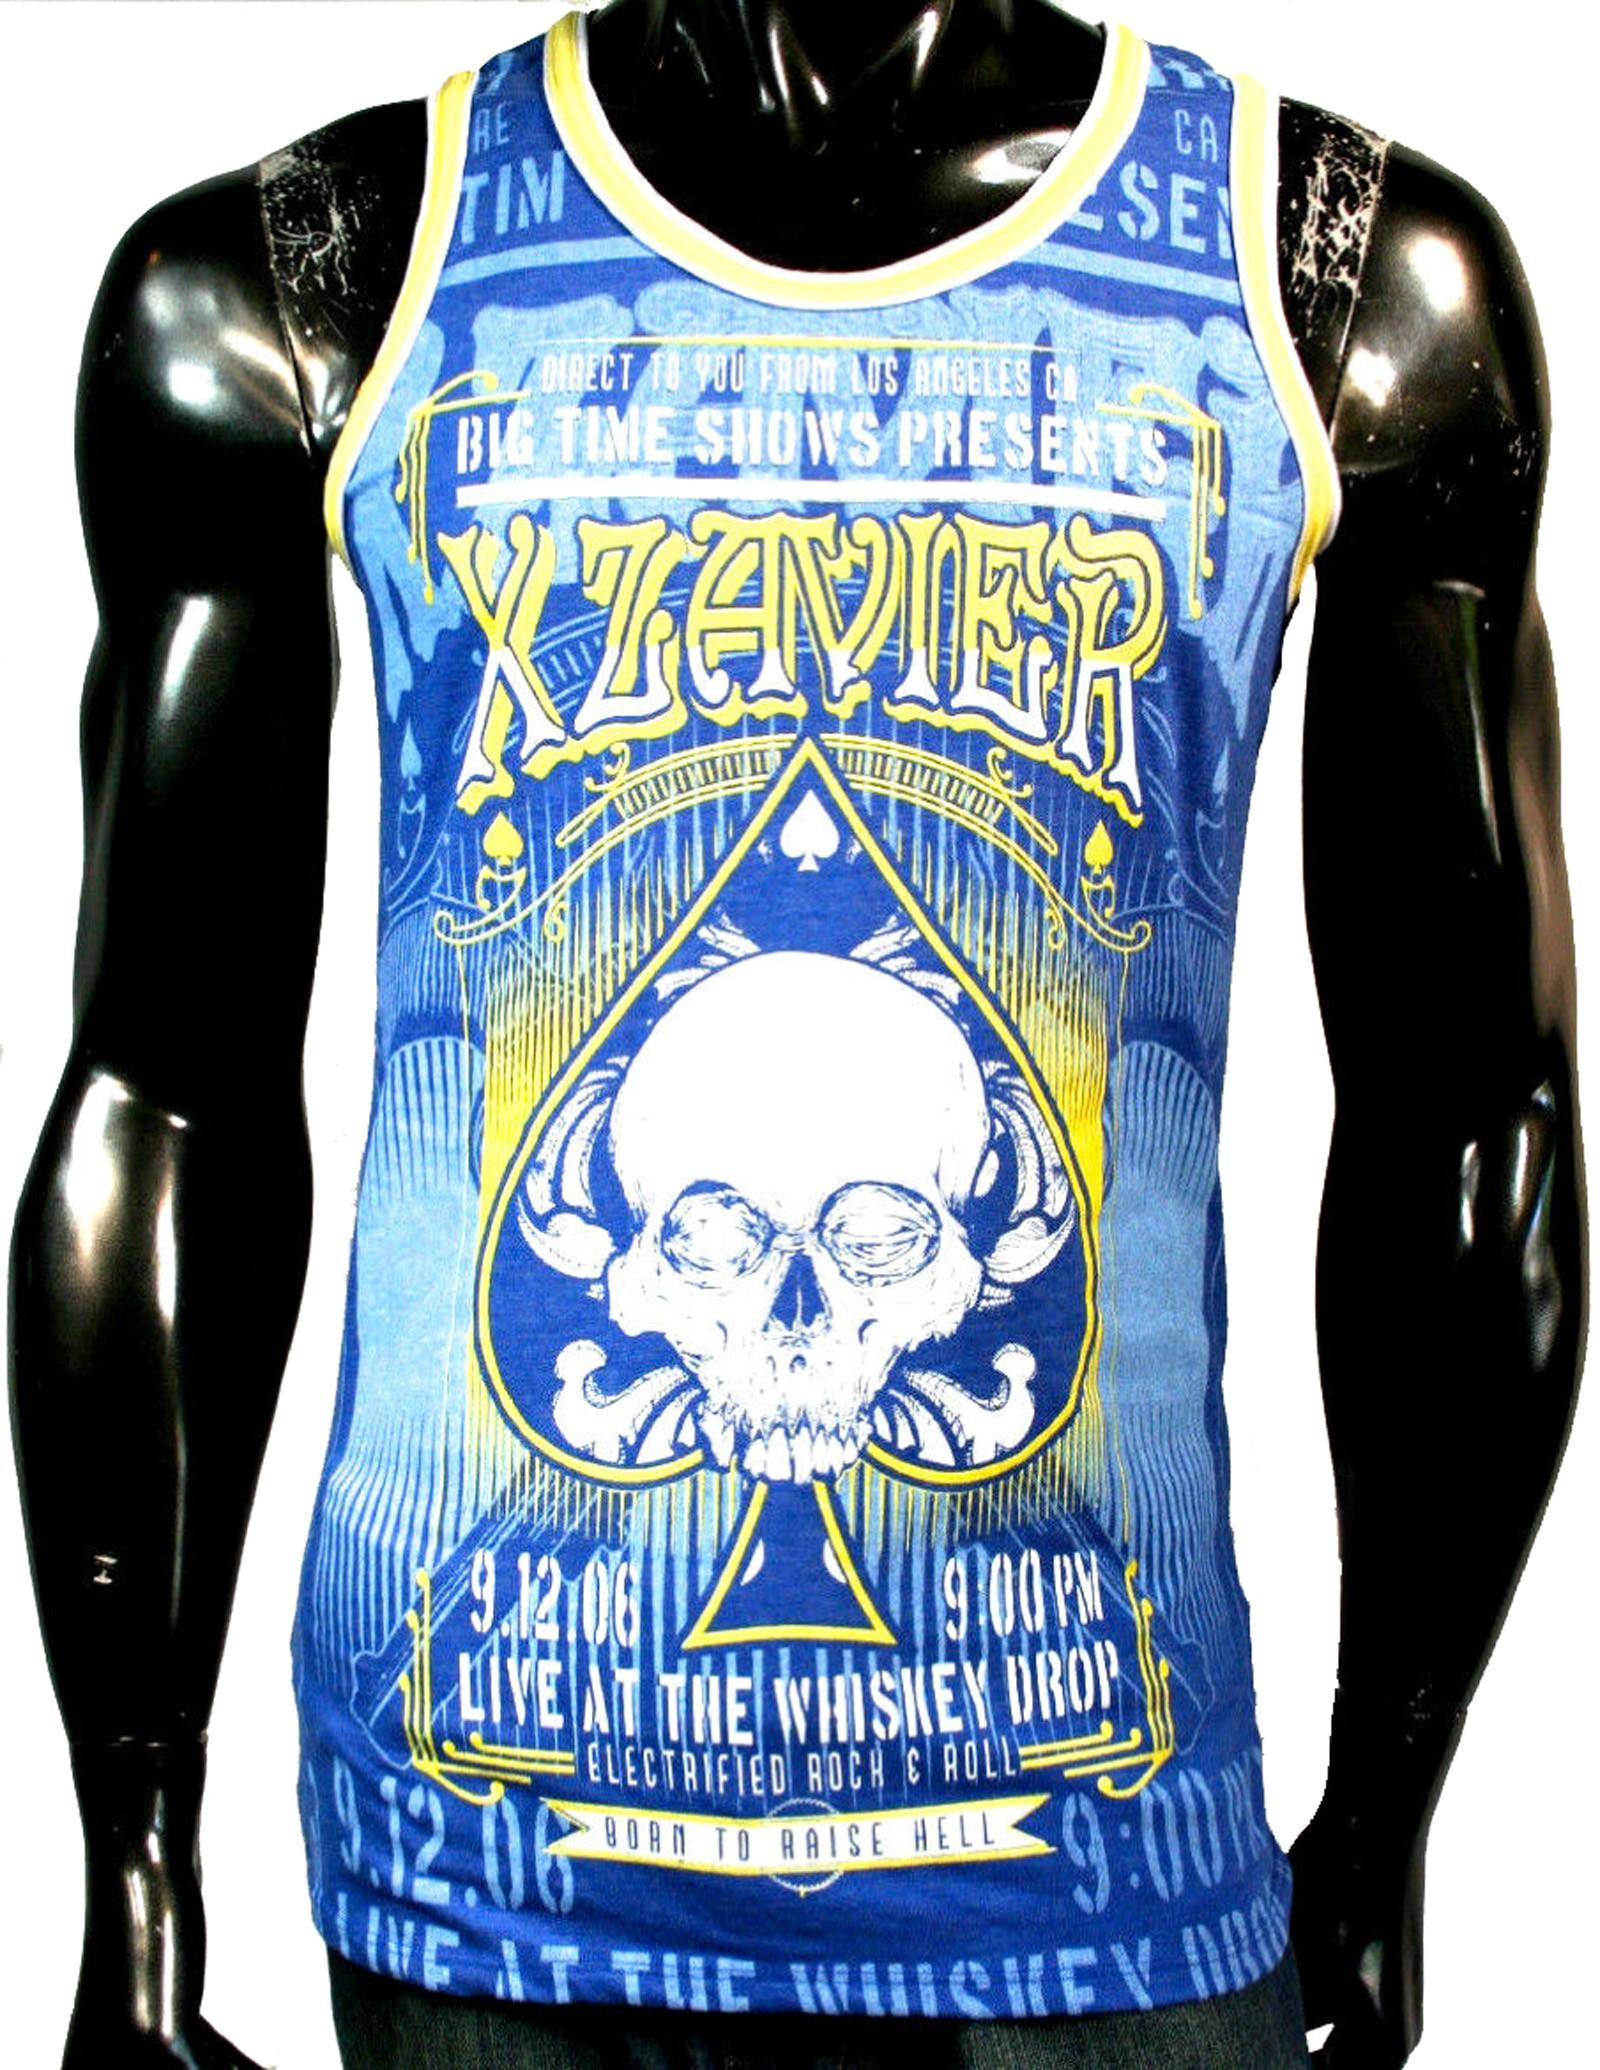 Xzavier - Ace of Spades Tank Top Shirt